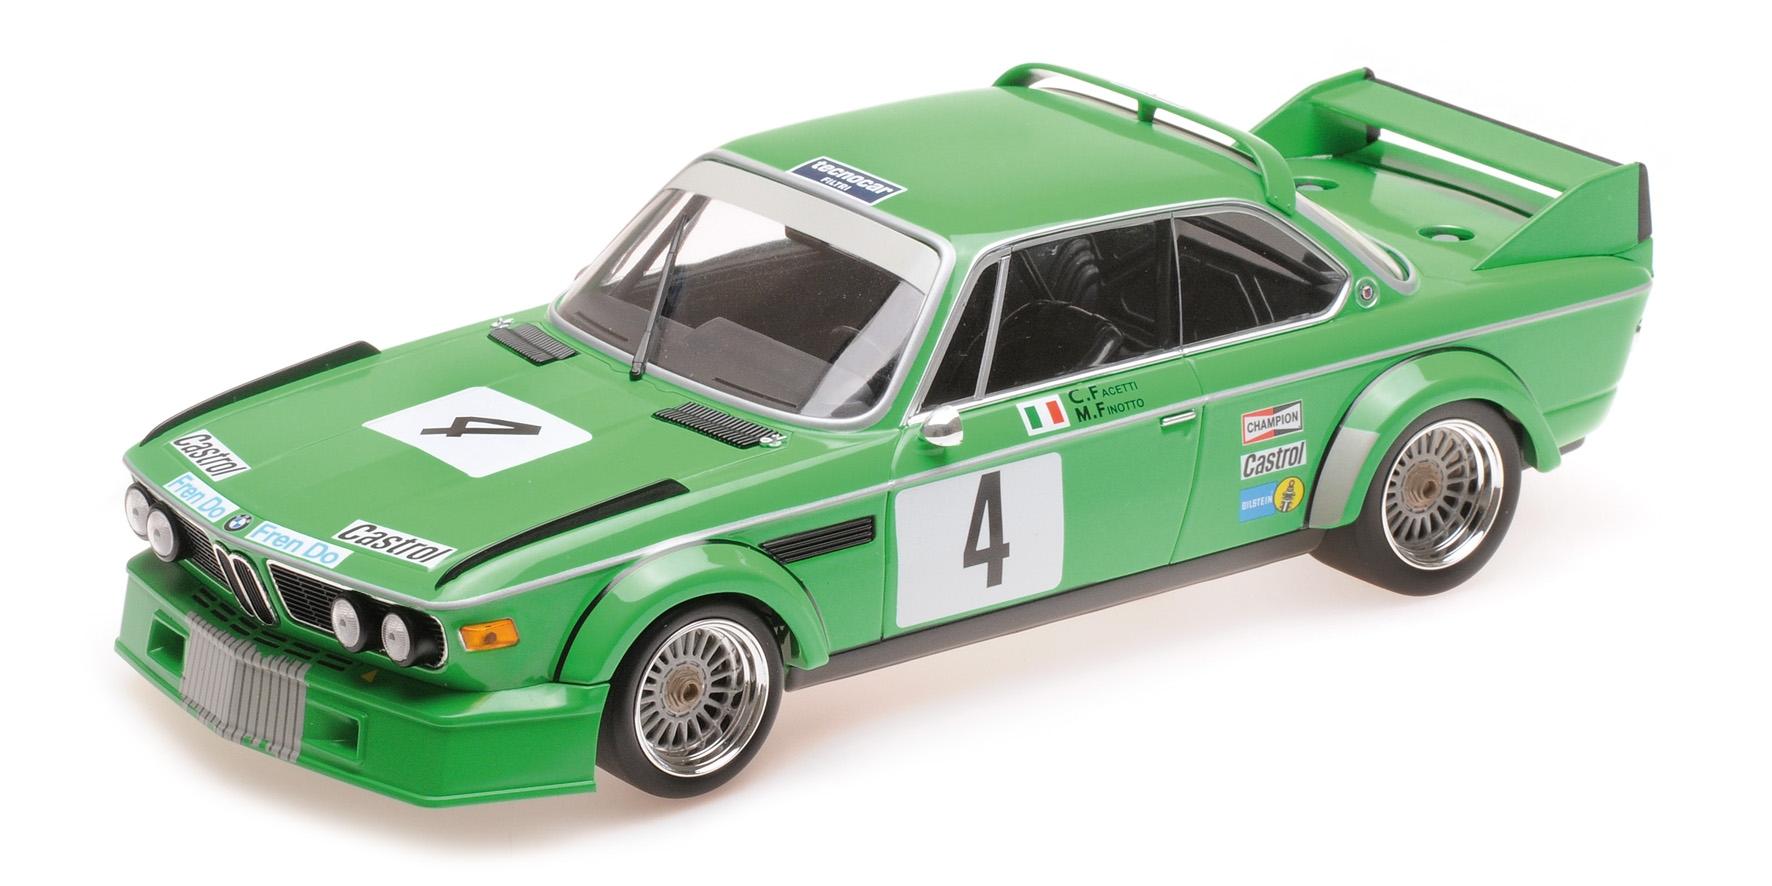 BMW 3.0 CSL JOLLY CLUB MILANO FINOTTO FACETTI WINNER ETCC ZANDVOORT 1979 Minicha